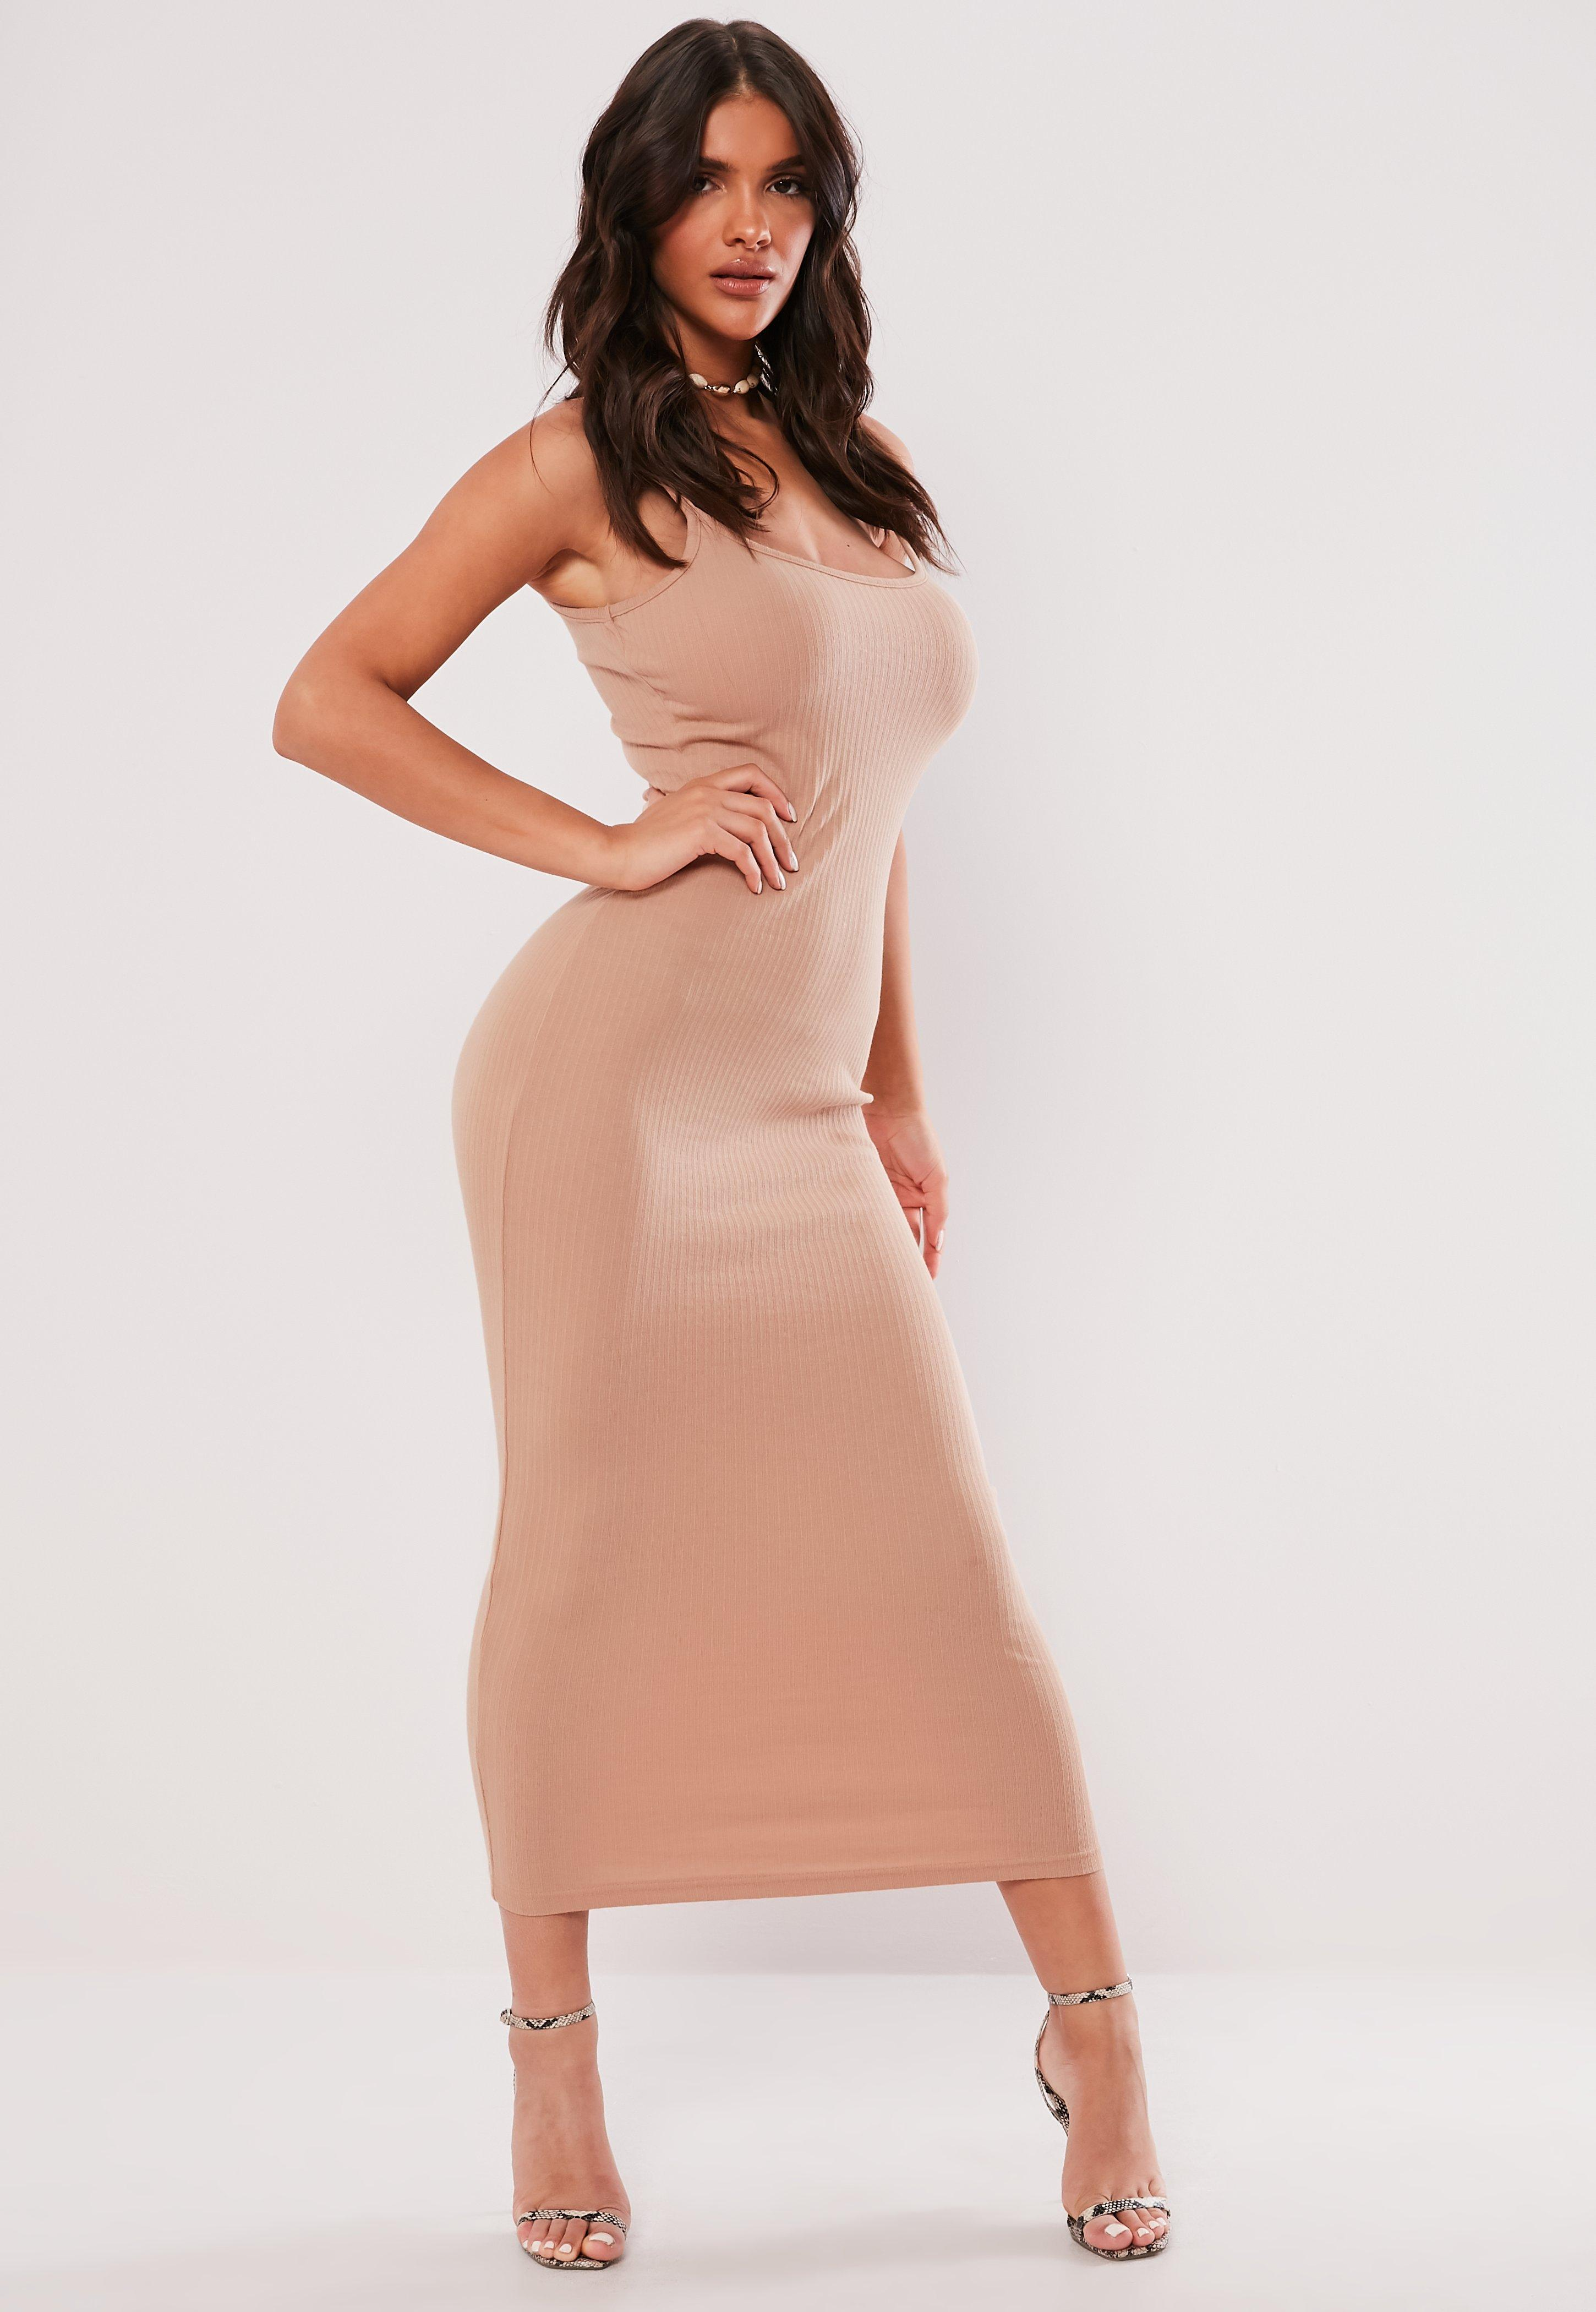 75c180da16 Missguided Nude Ribbed Strappy Bodycon Midi Dress in Natural - Save ...